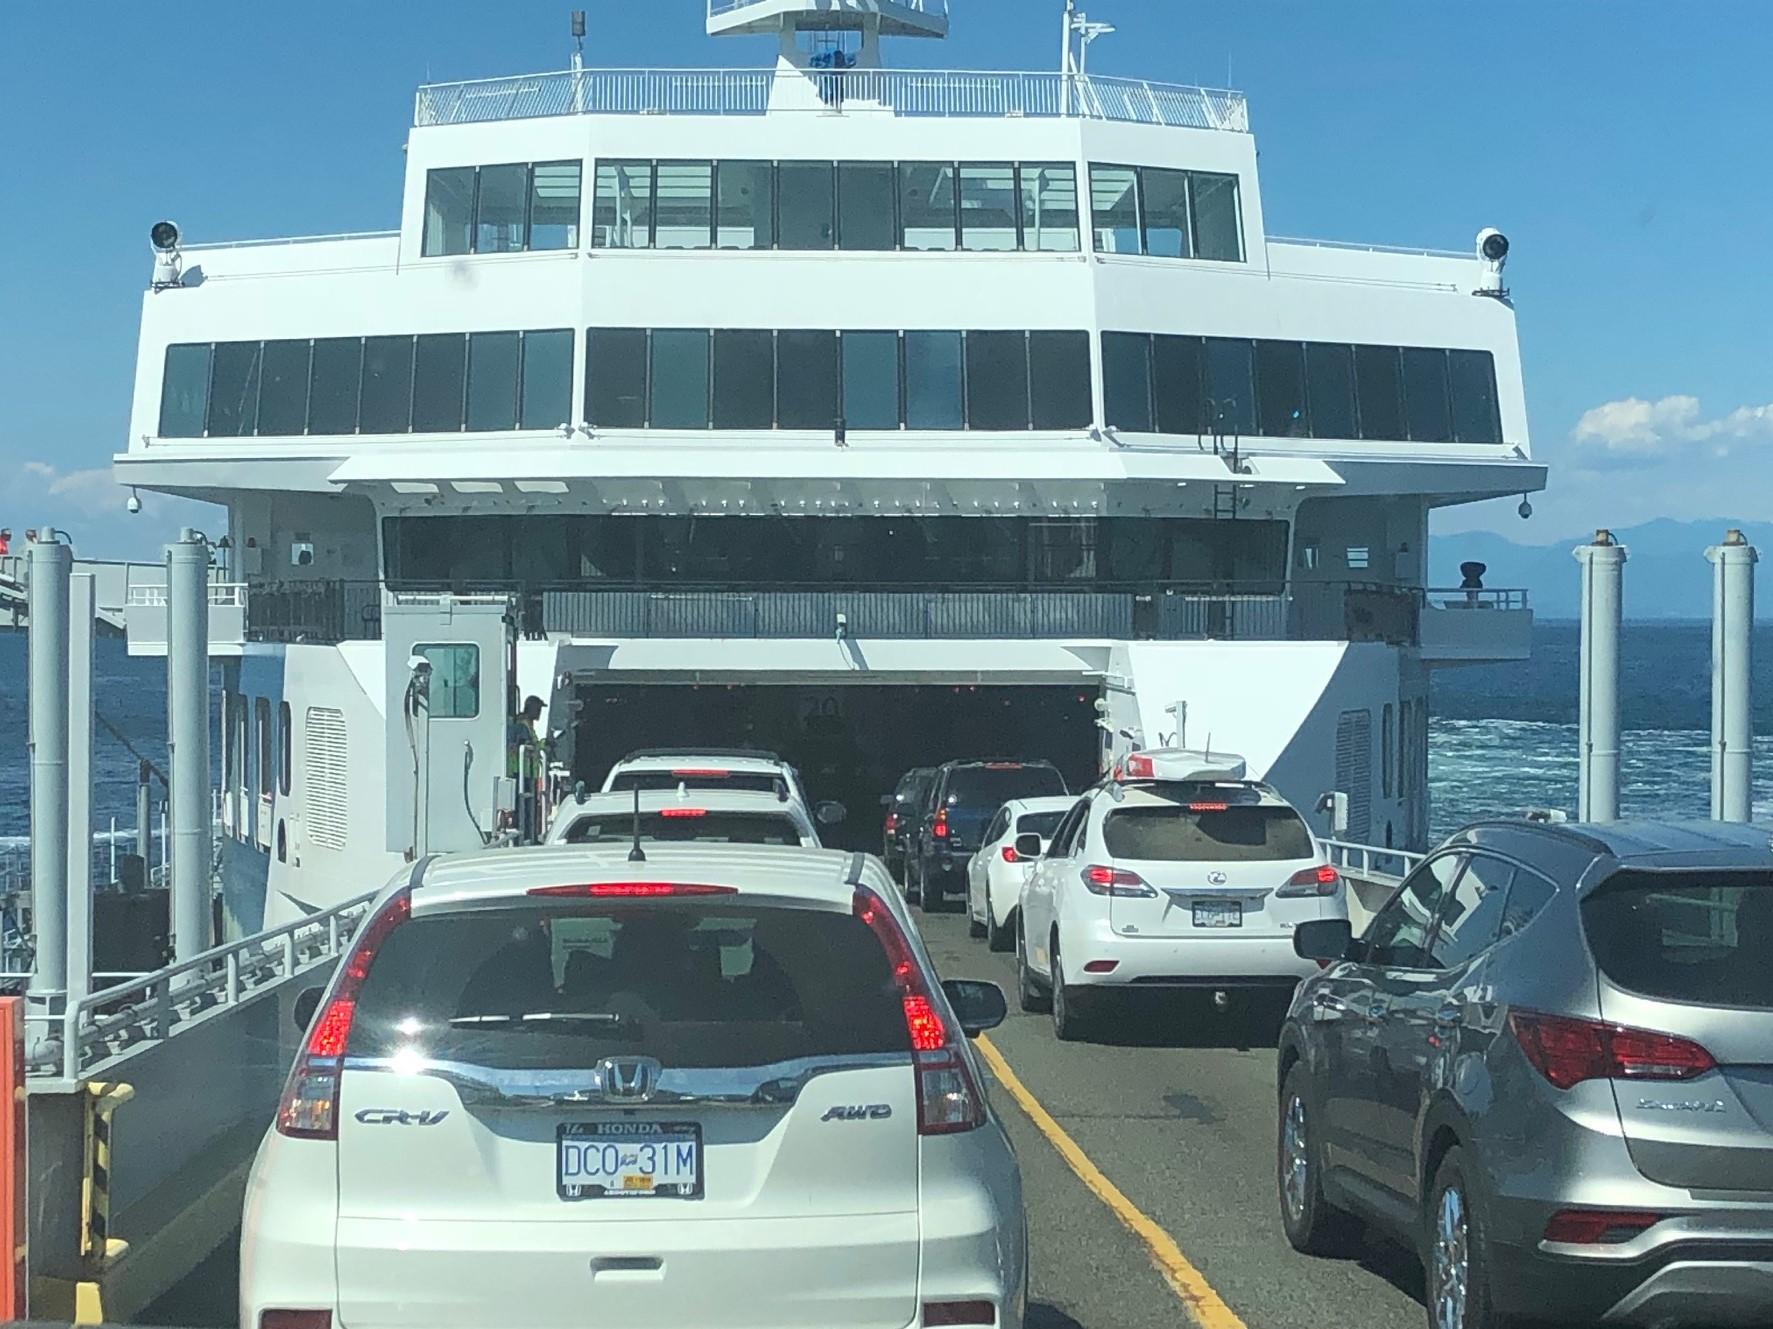 BC has beautiful, comfortable ferries